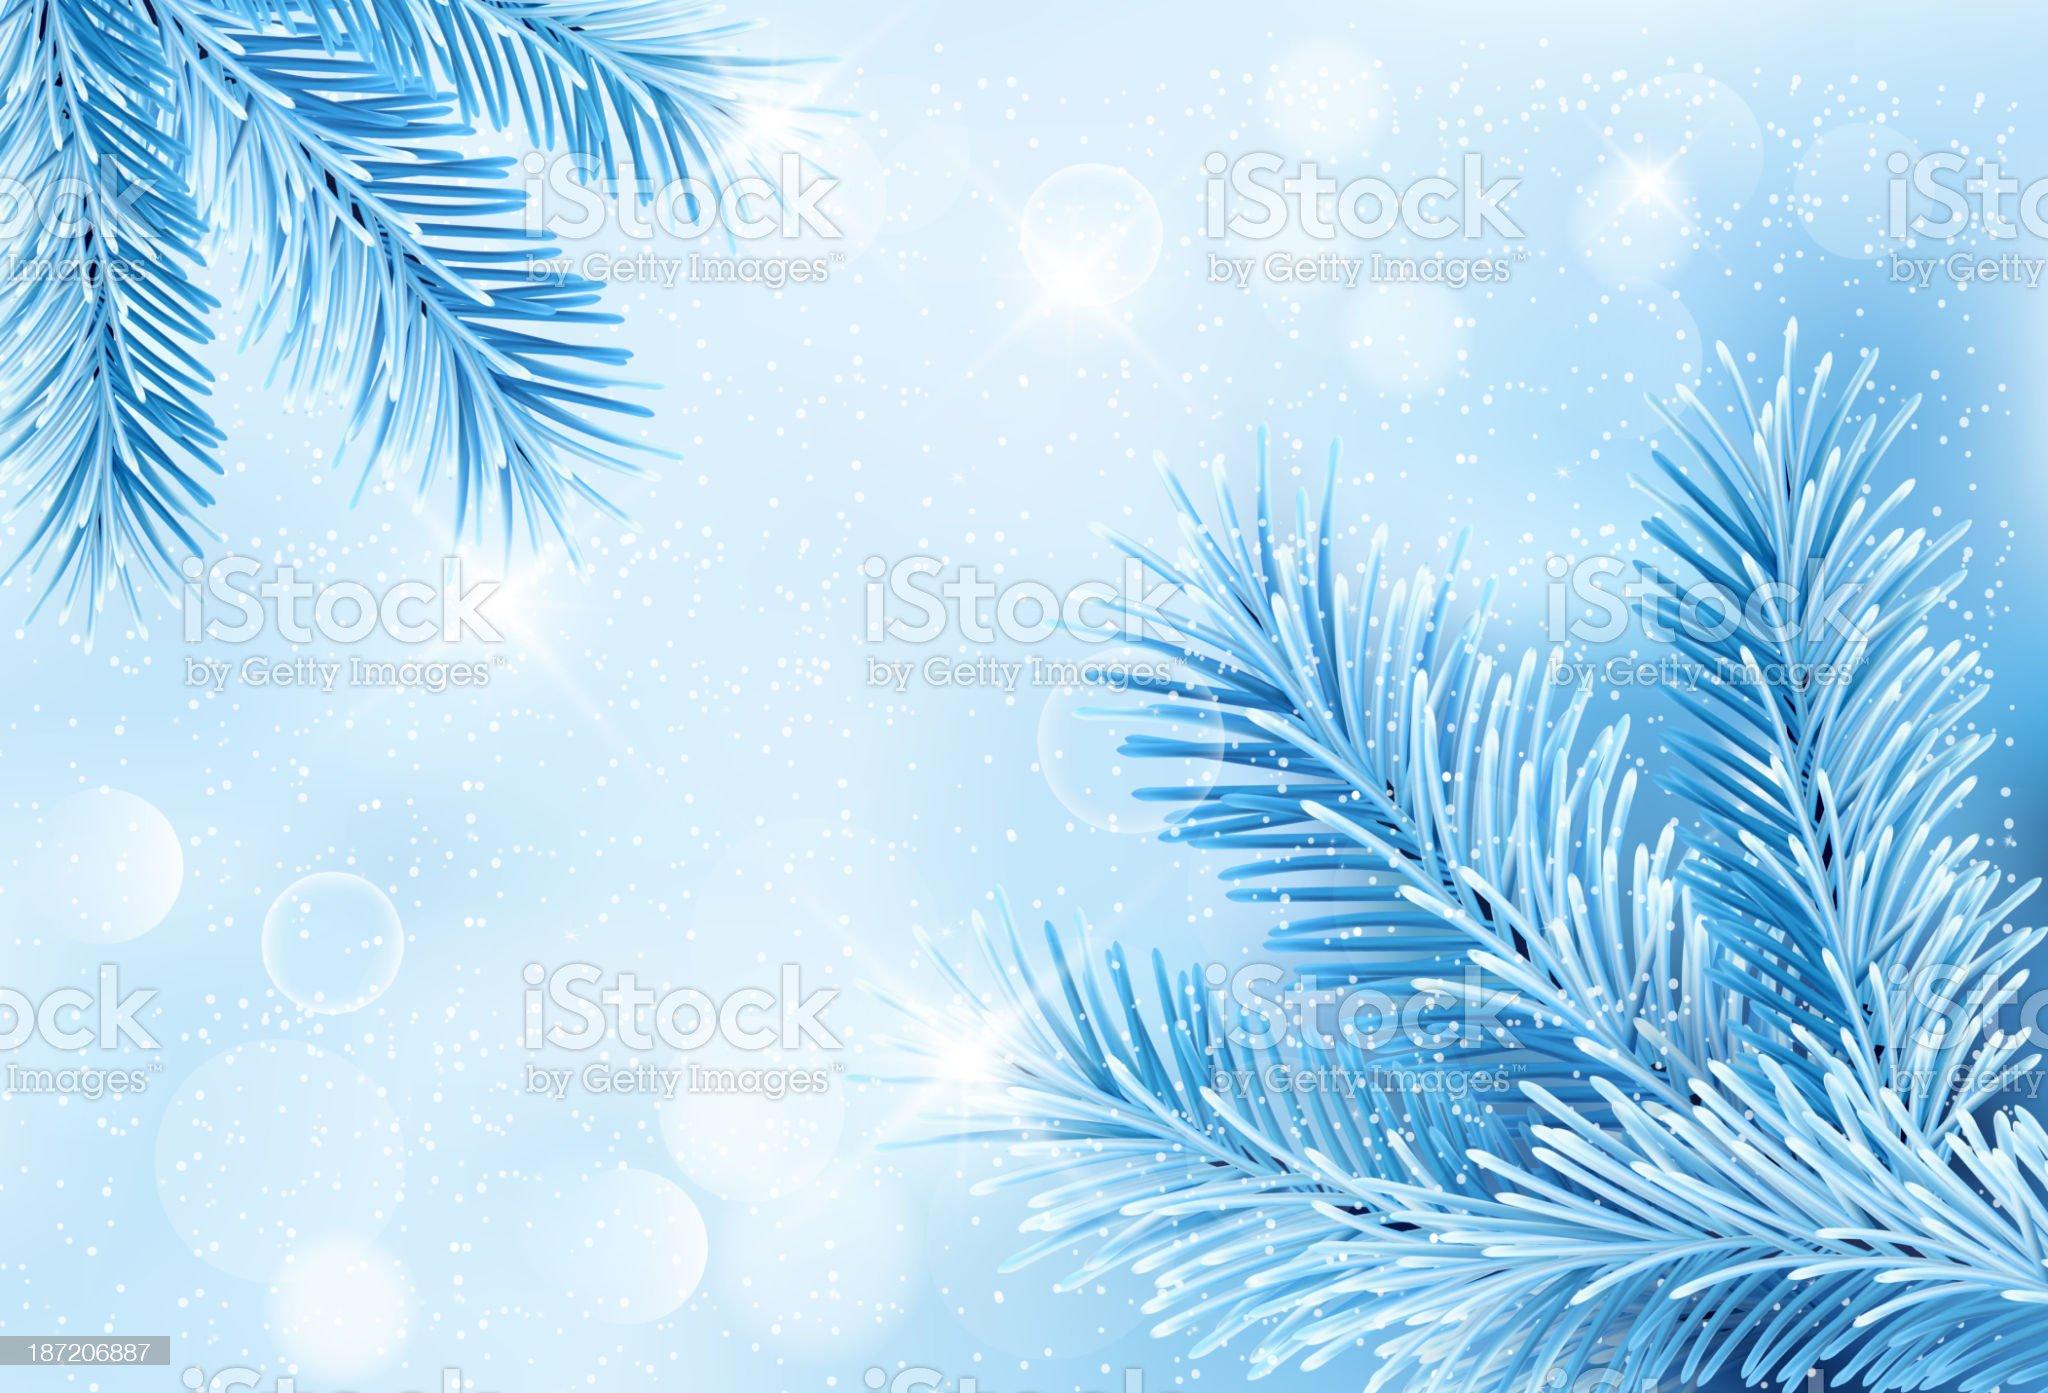 Happy new year 2014! royalty-free stock vector art